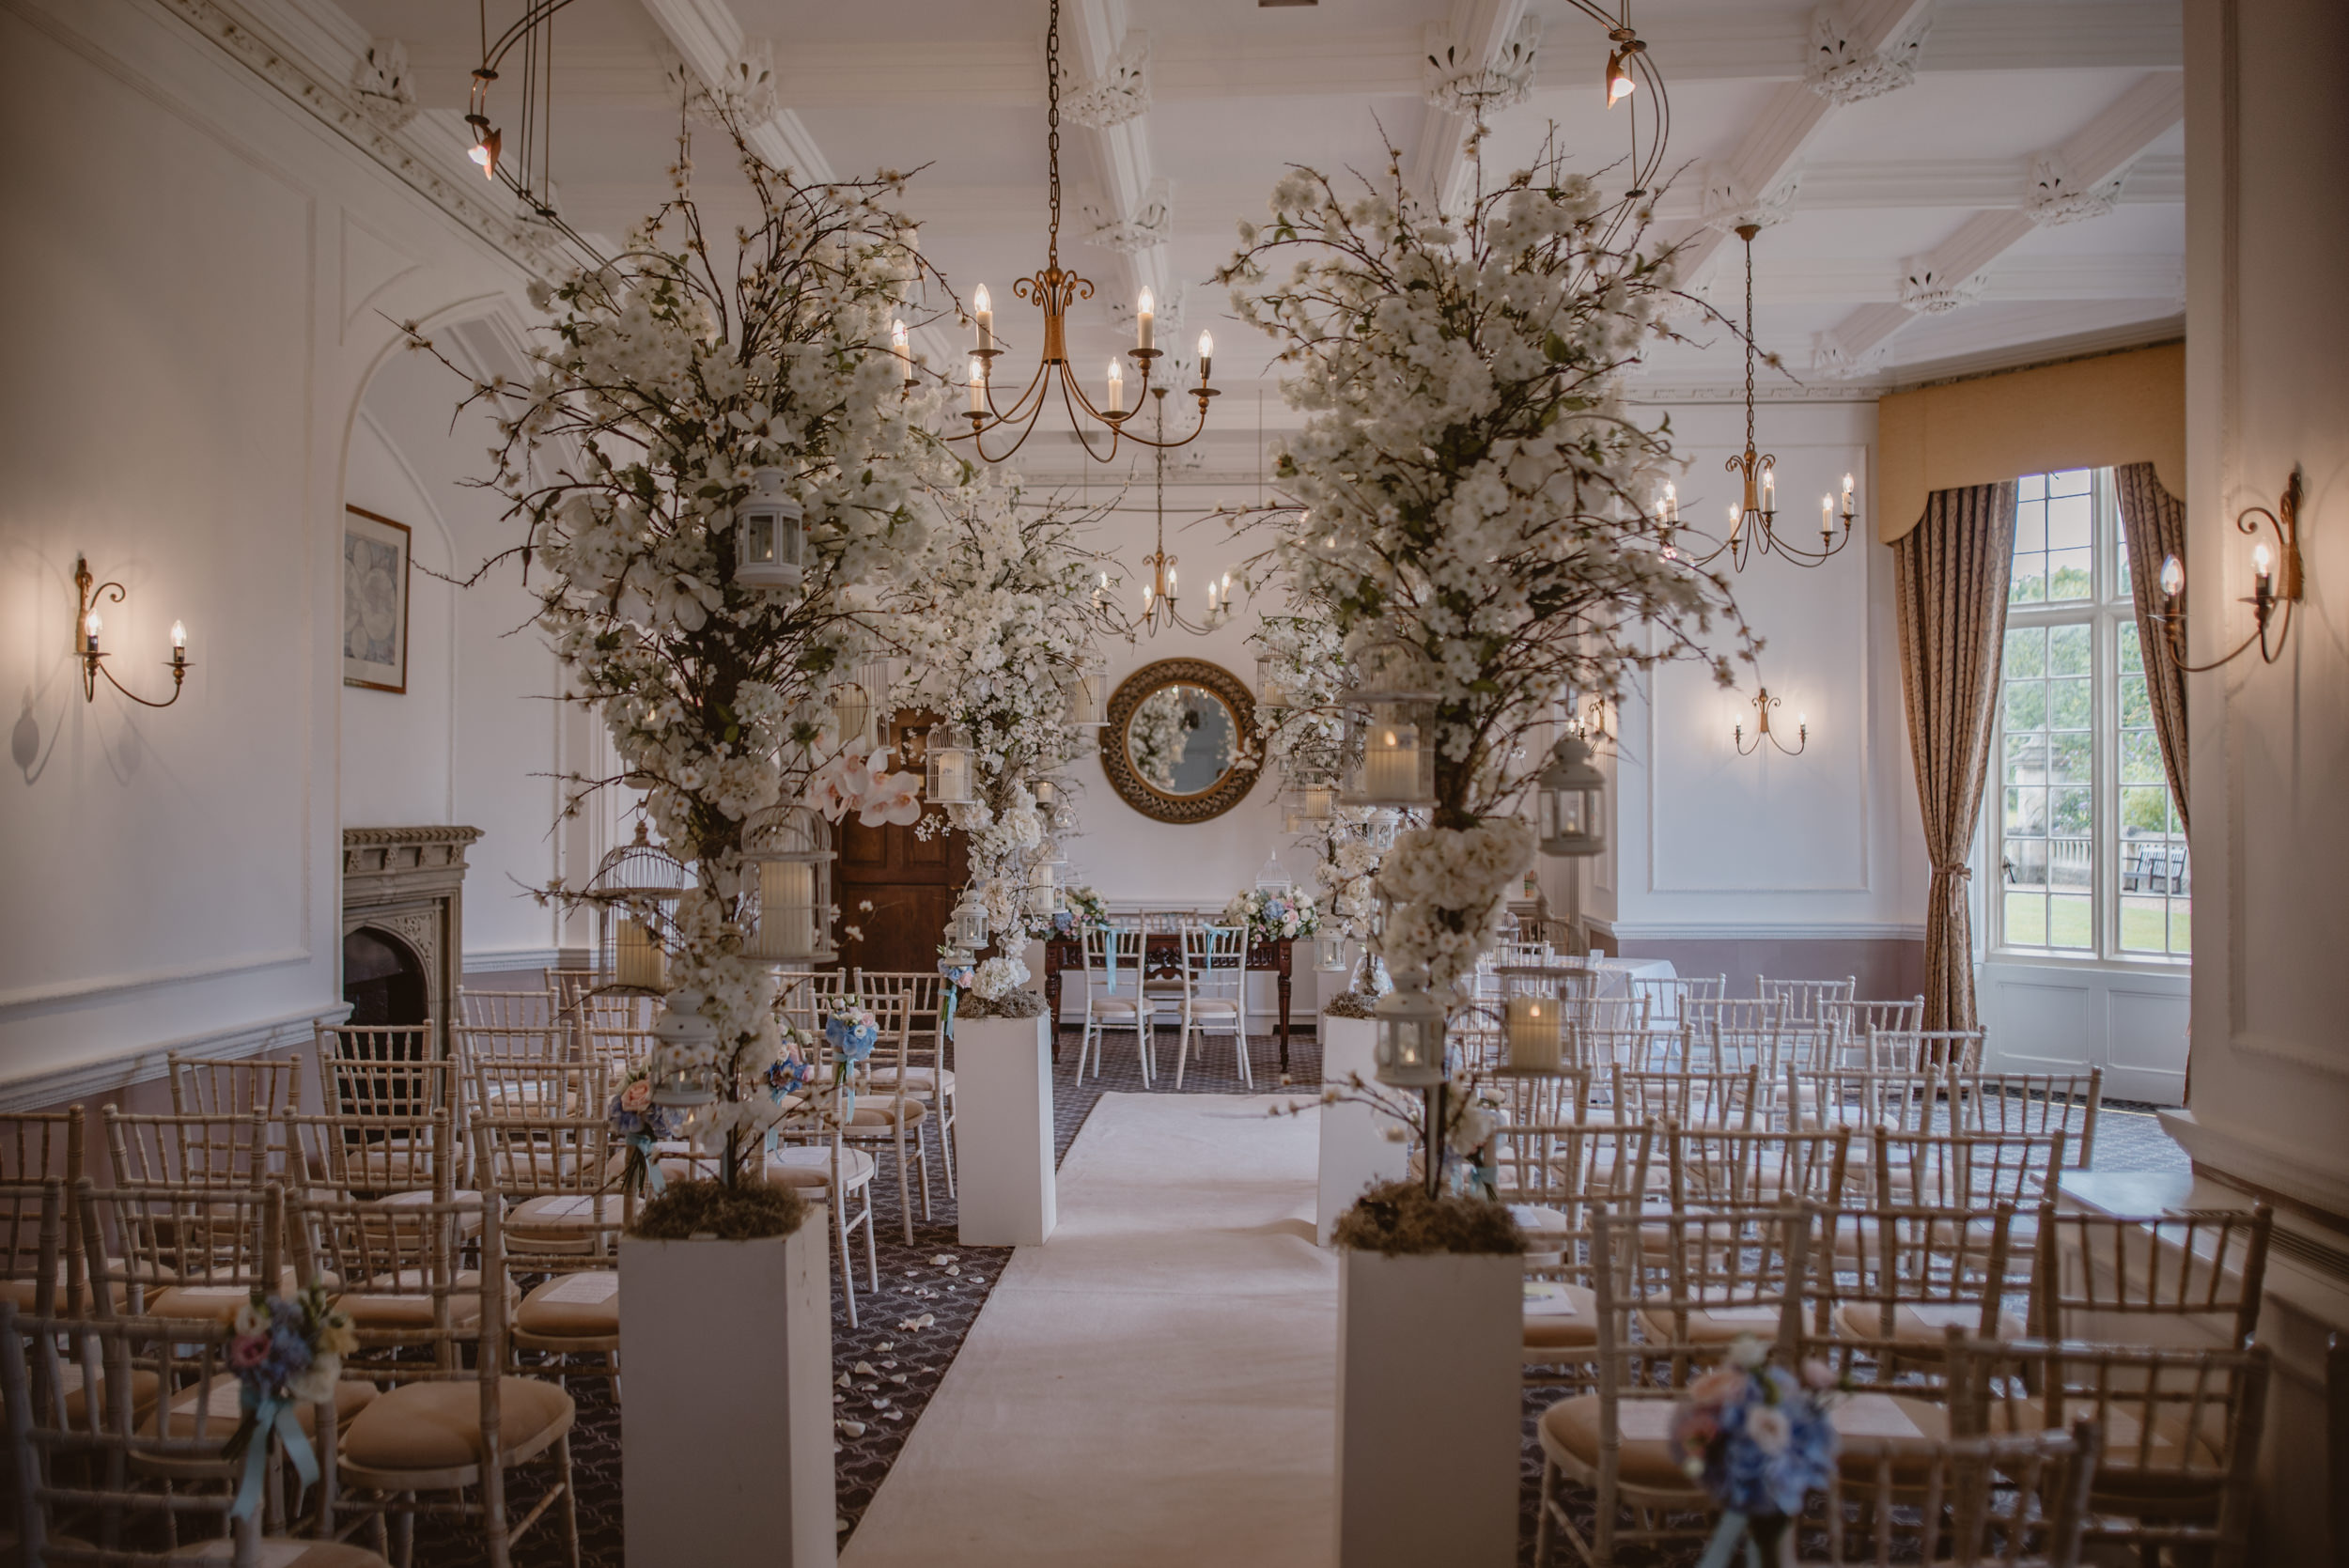 Rachel-and-James-Wedding-Horsley-Towers-State-Manu-Mendoza-Wedding-Photography-108.jpg